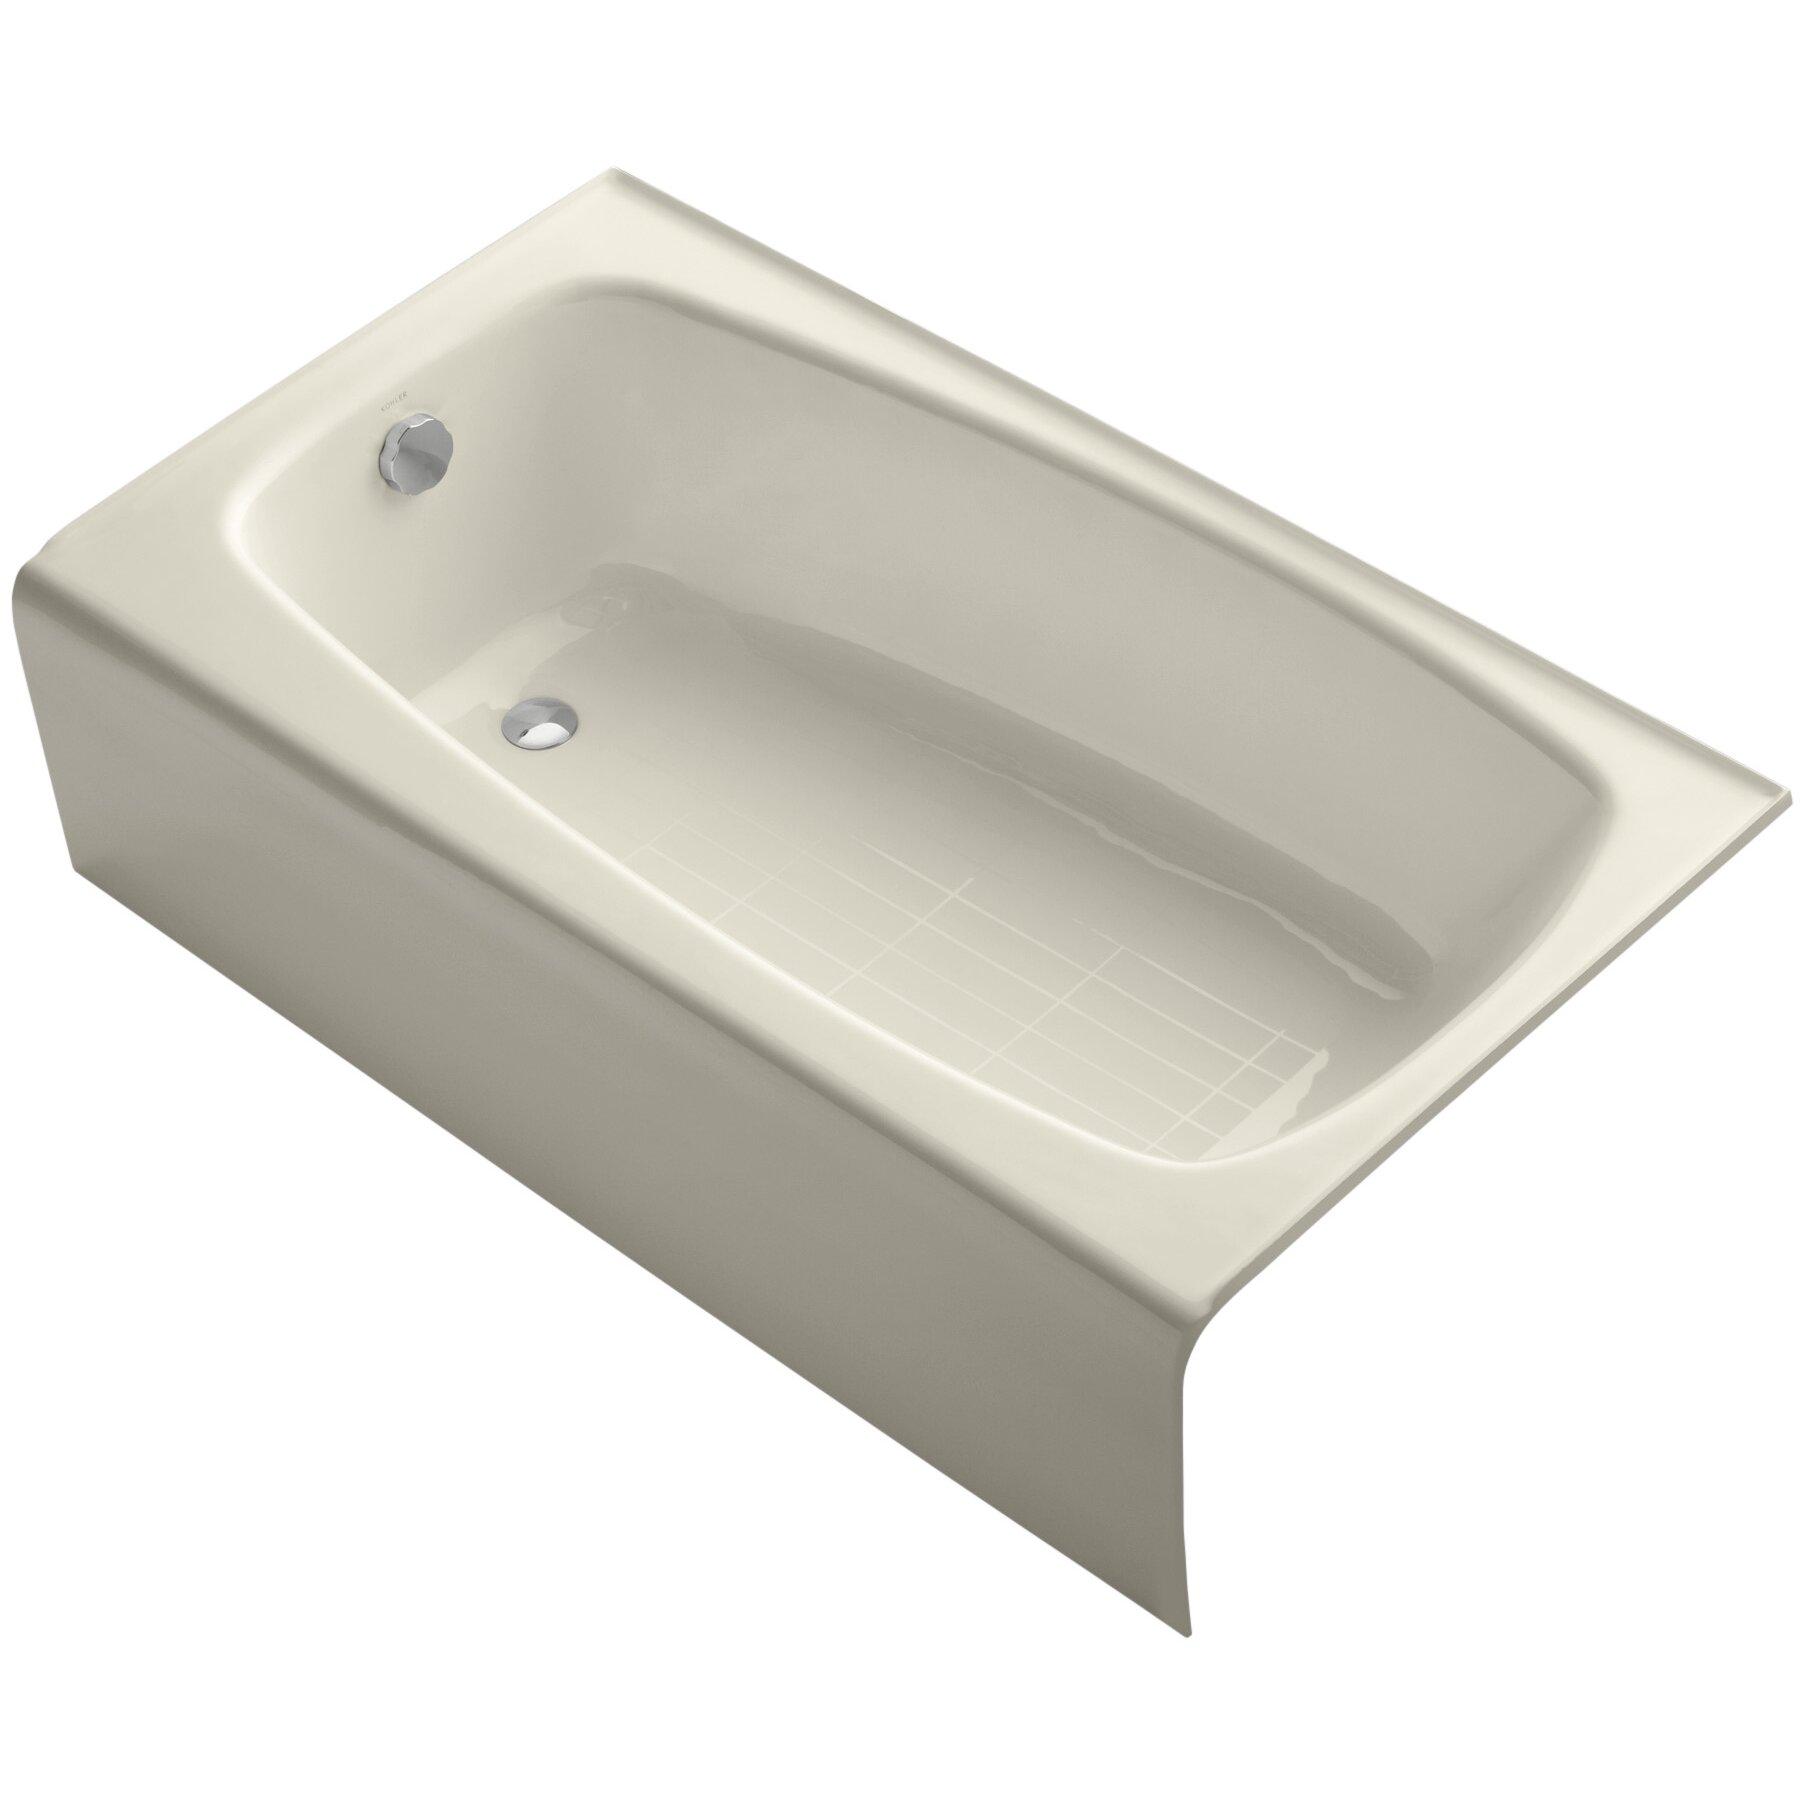 Bathtub Kohler : Home Improvement Bathroom Fixtures ... Kohler Part #: K-745 SKU ...